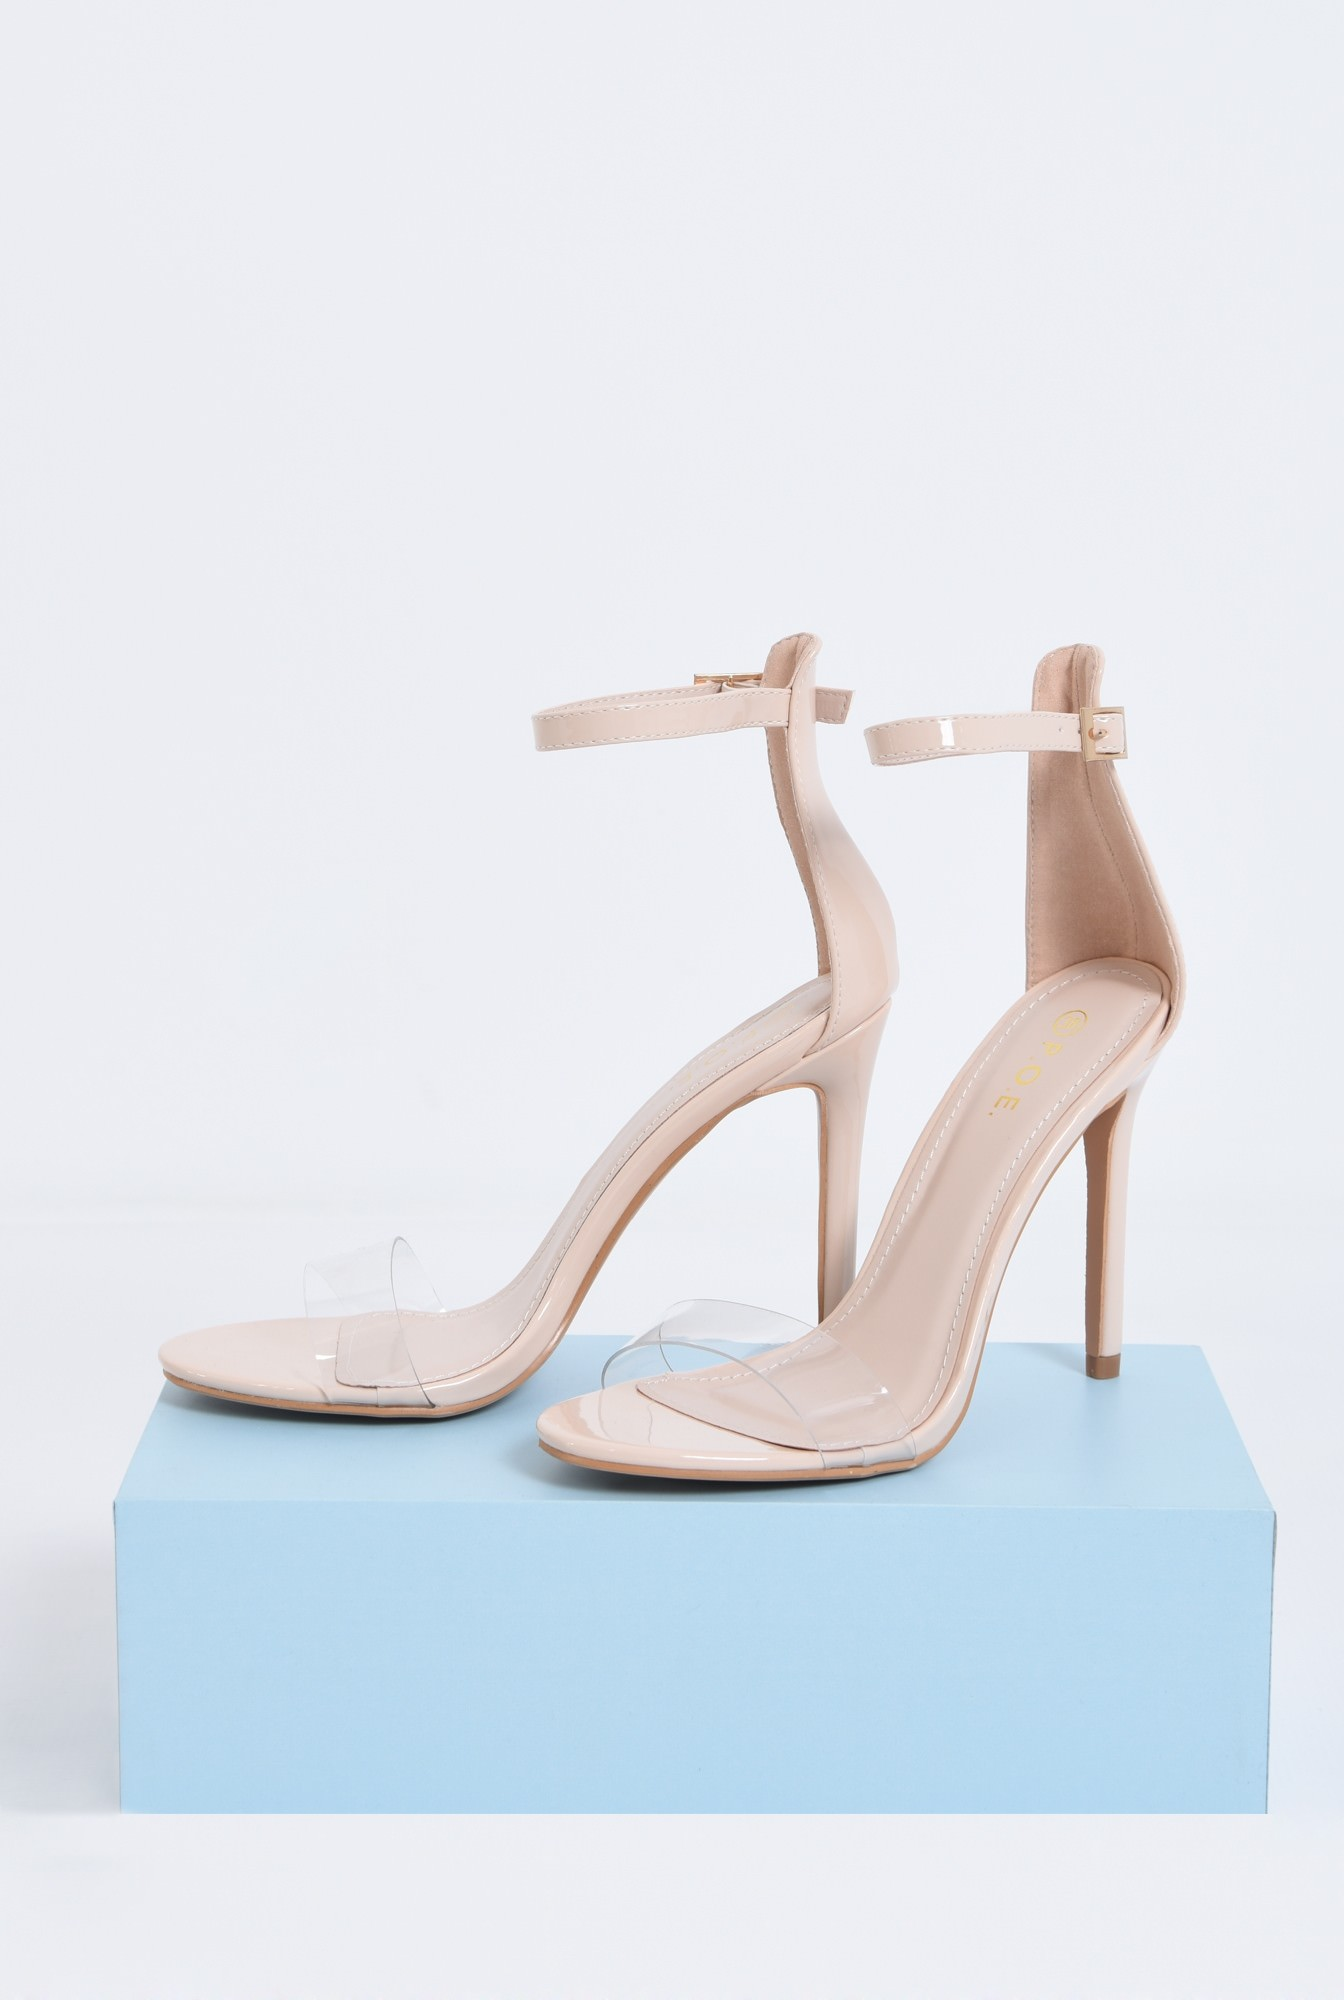 2 - sandale elegante, nude, lac, stiletto